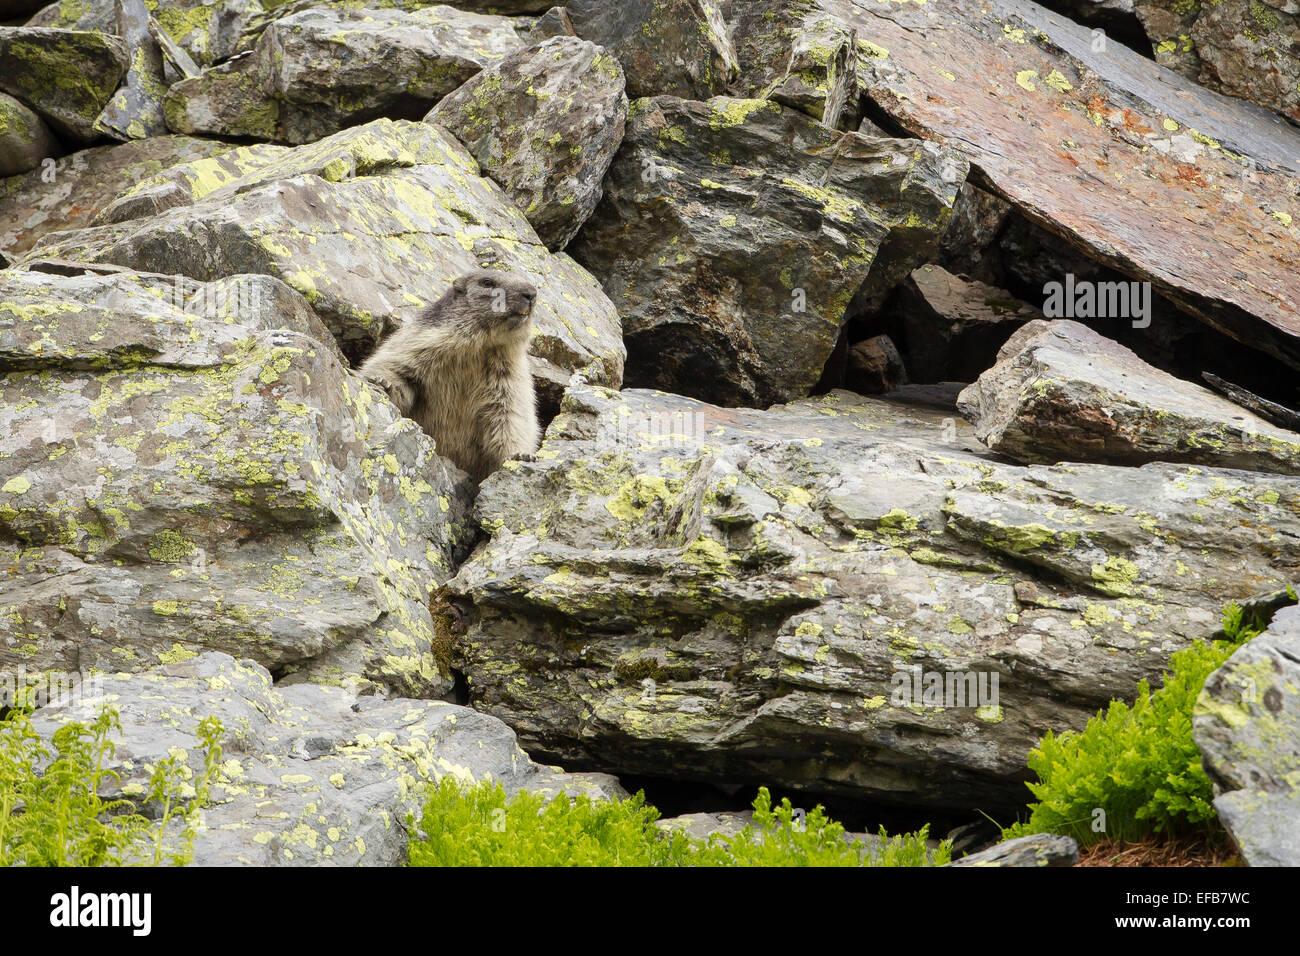 Alpine Marmot (Marmota marmota) - France - Stock Image